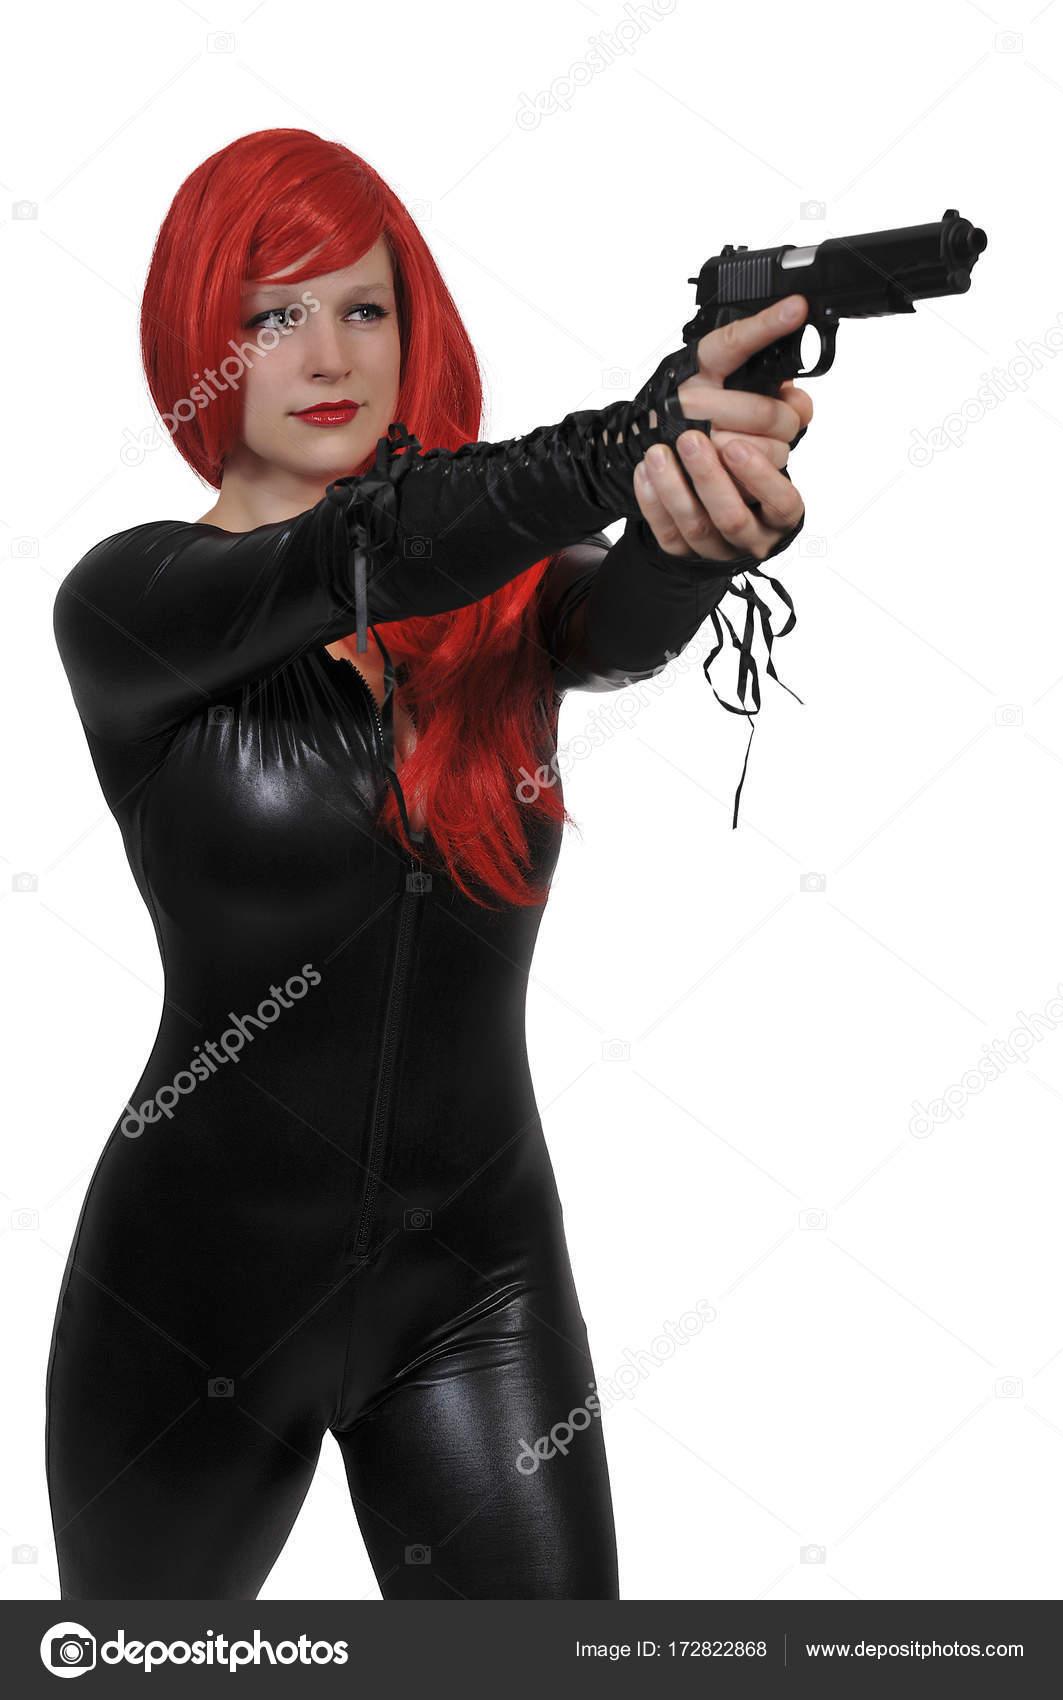 b3badddbbacb mulher com pistola — Stock Photo © robeo123 #172822868